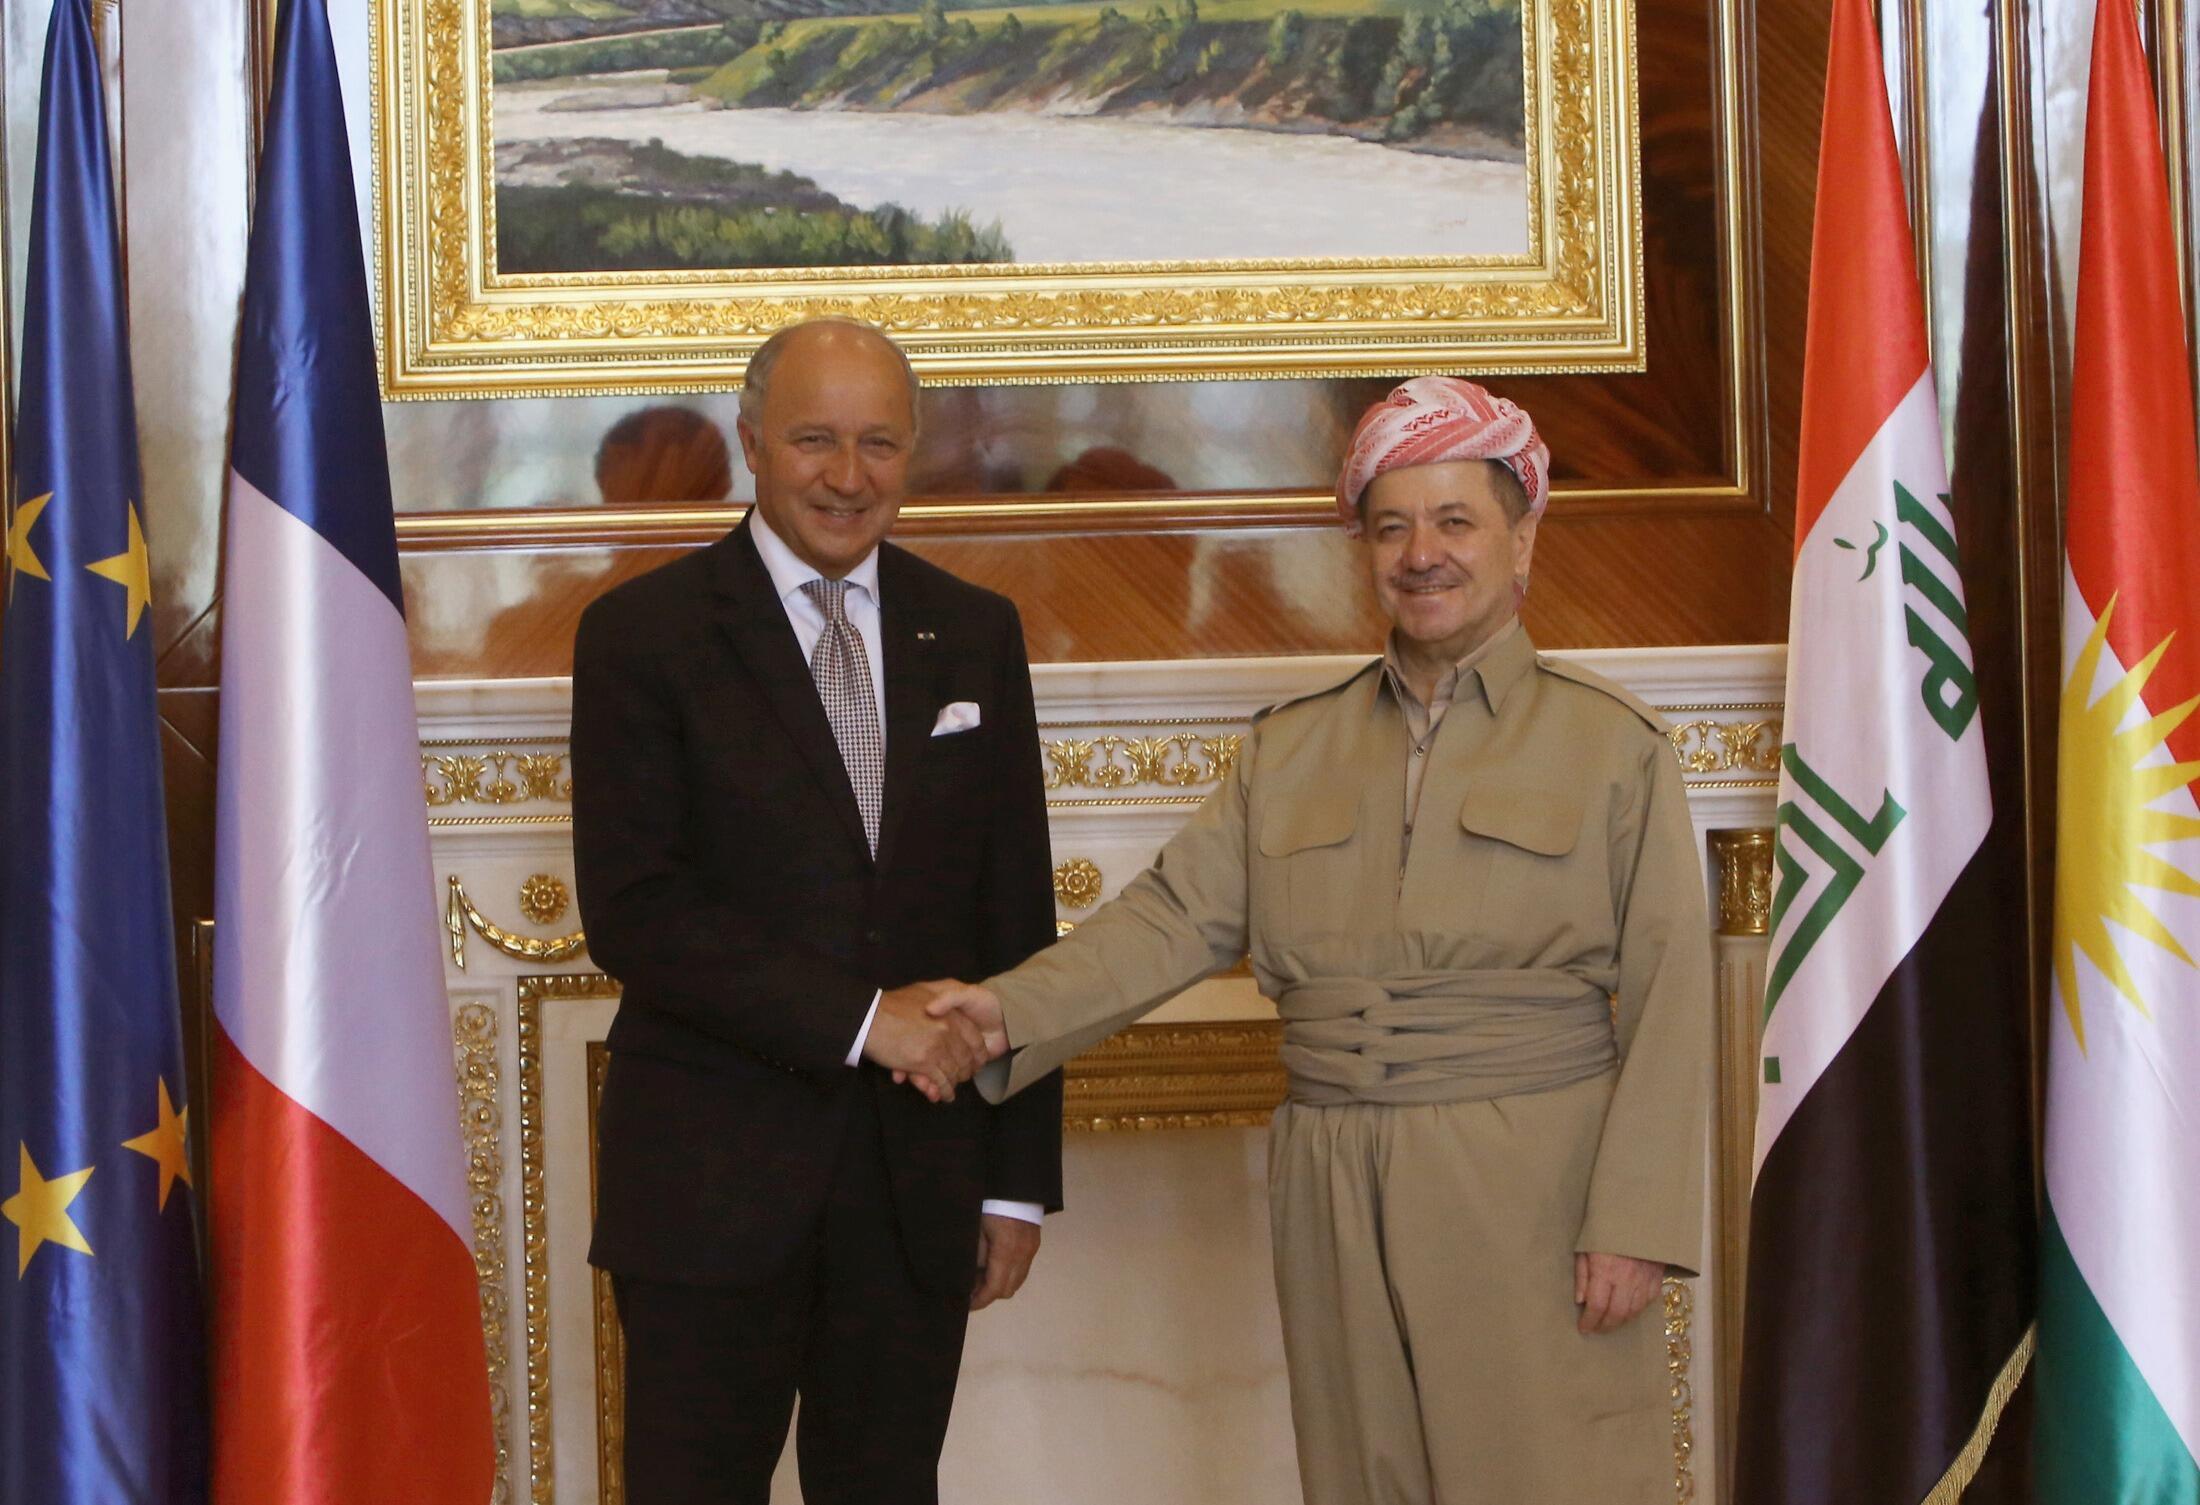 Министра иностранных дел Франции Лоран Фабиус (слева) и президент иракского Курдистана Масул Барзани, Эрбиль, 10 августа 2014 г.